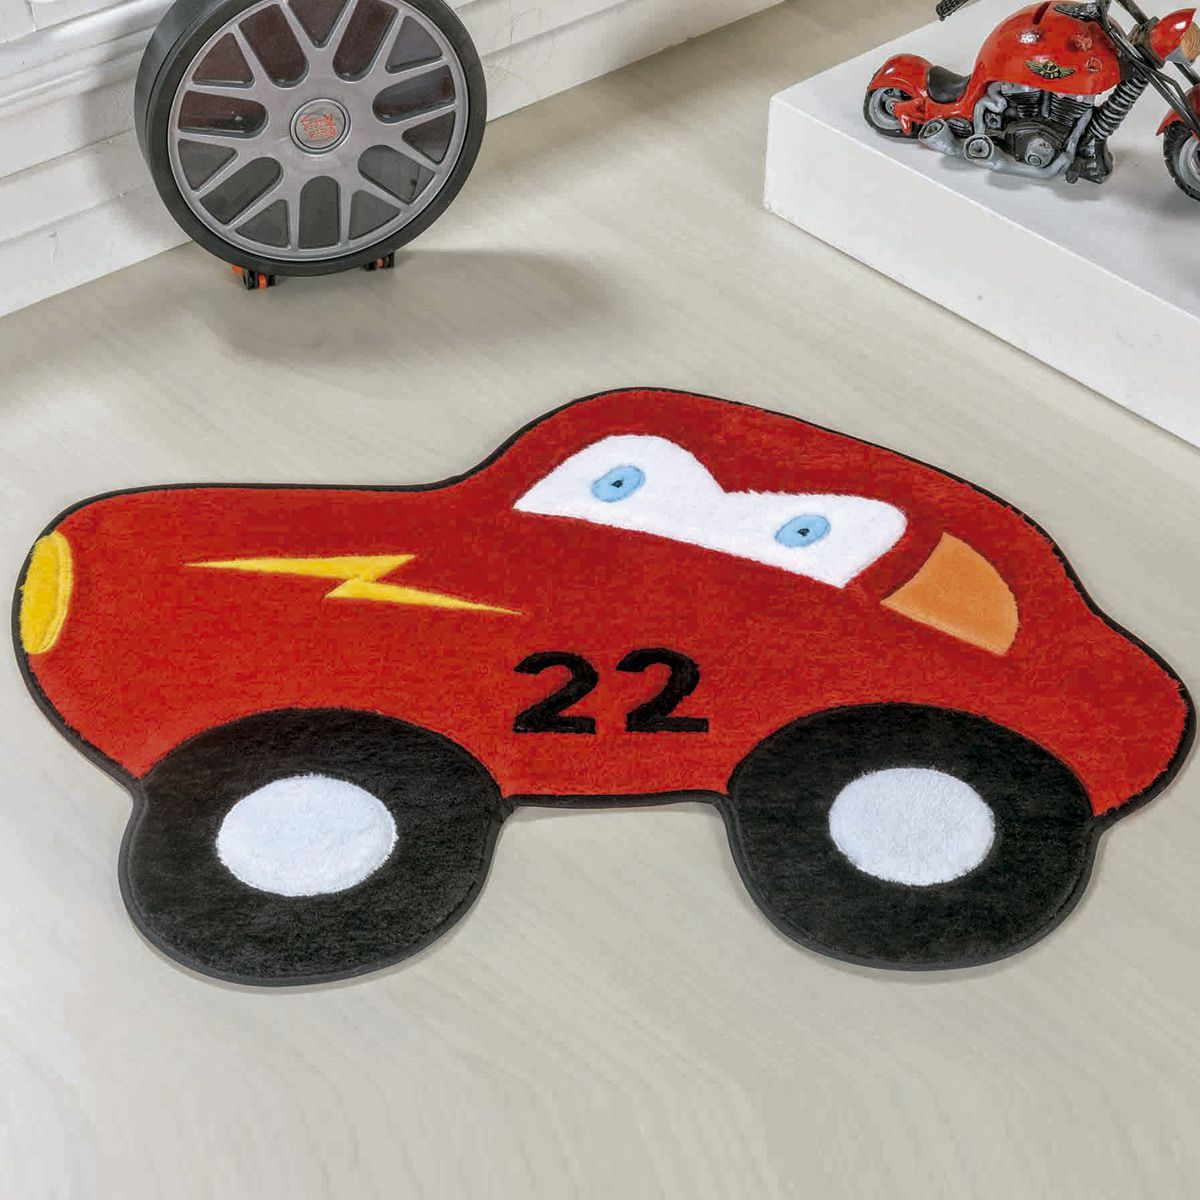 Tapete Infantil Premium Formato Carrinho 22 Vermelho 74cm x 56cm